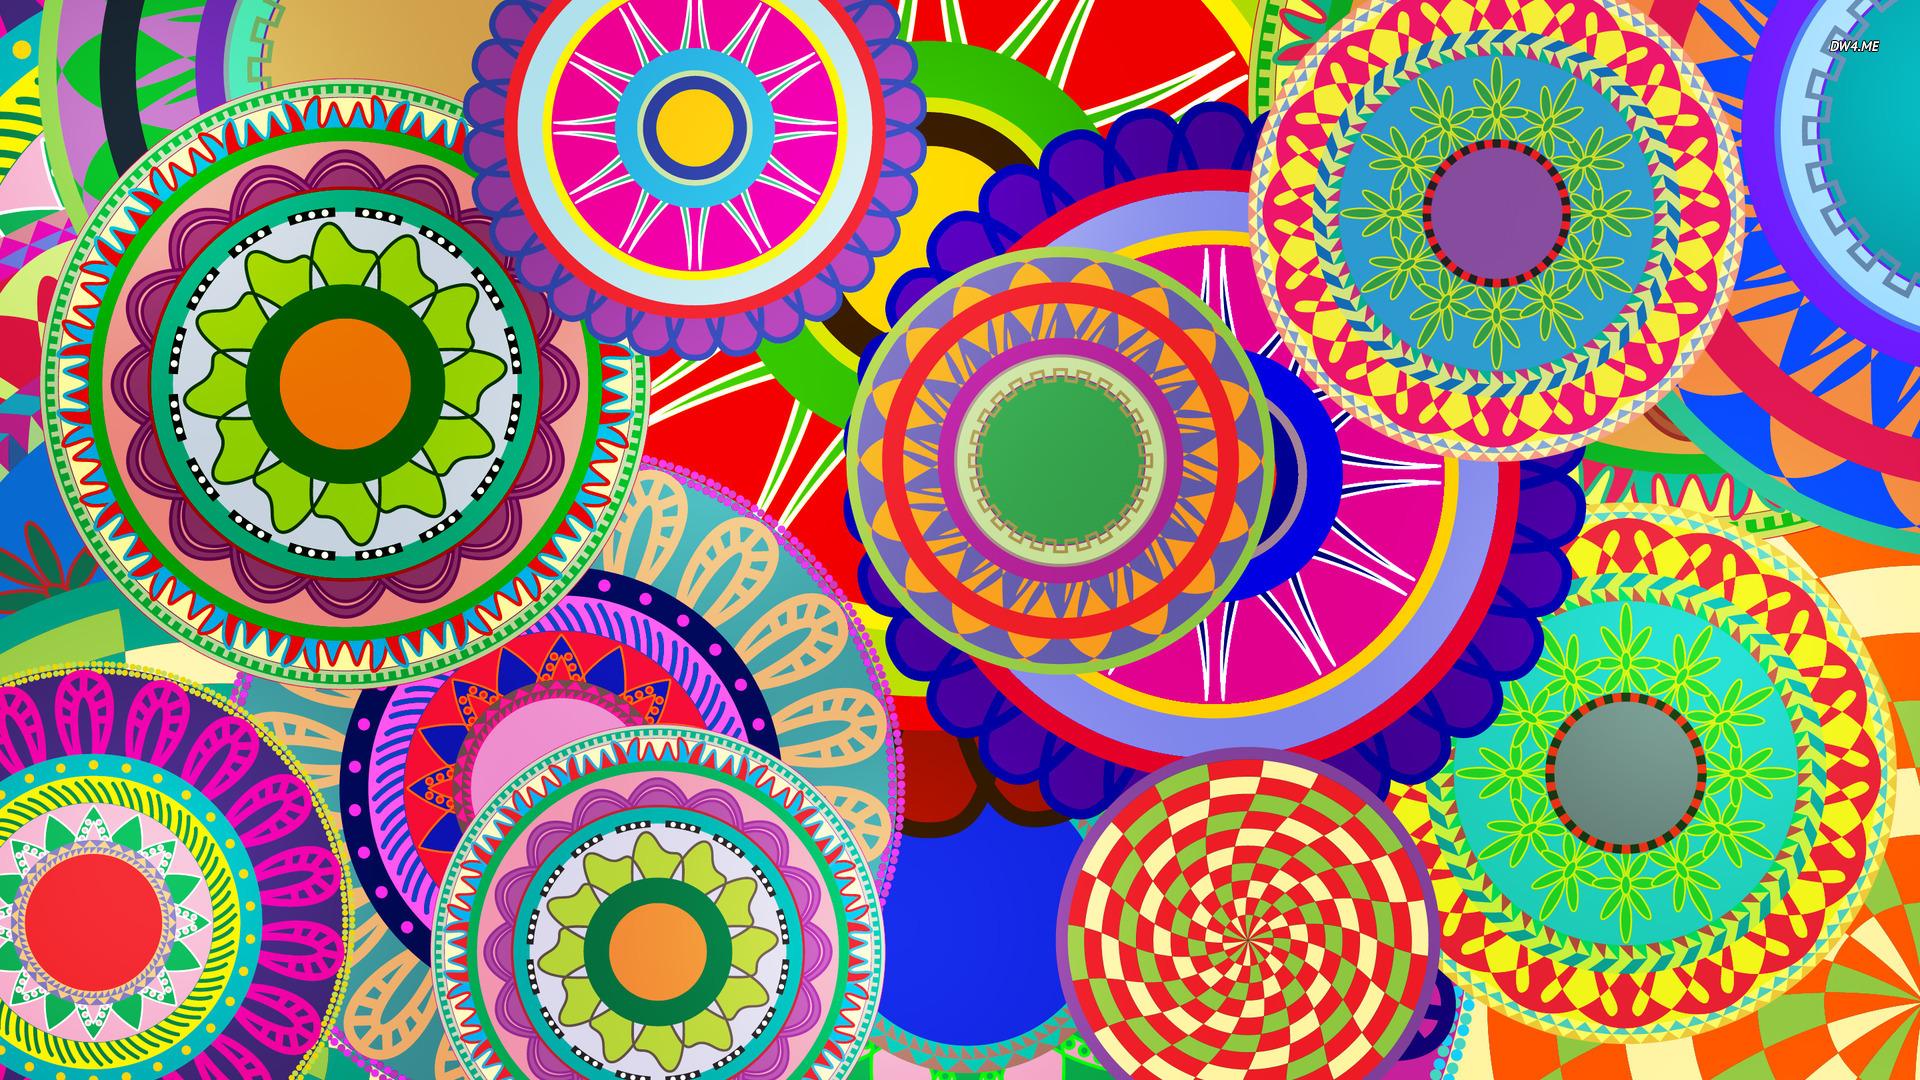 Colorful Flower Wallpaper Designs Punkie